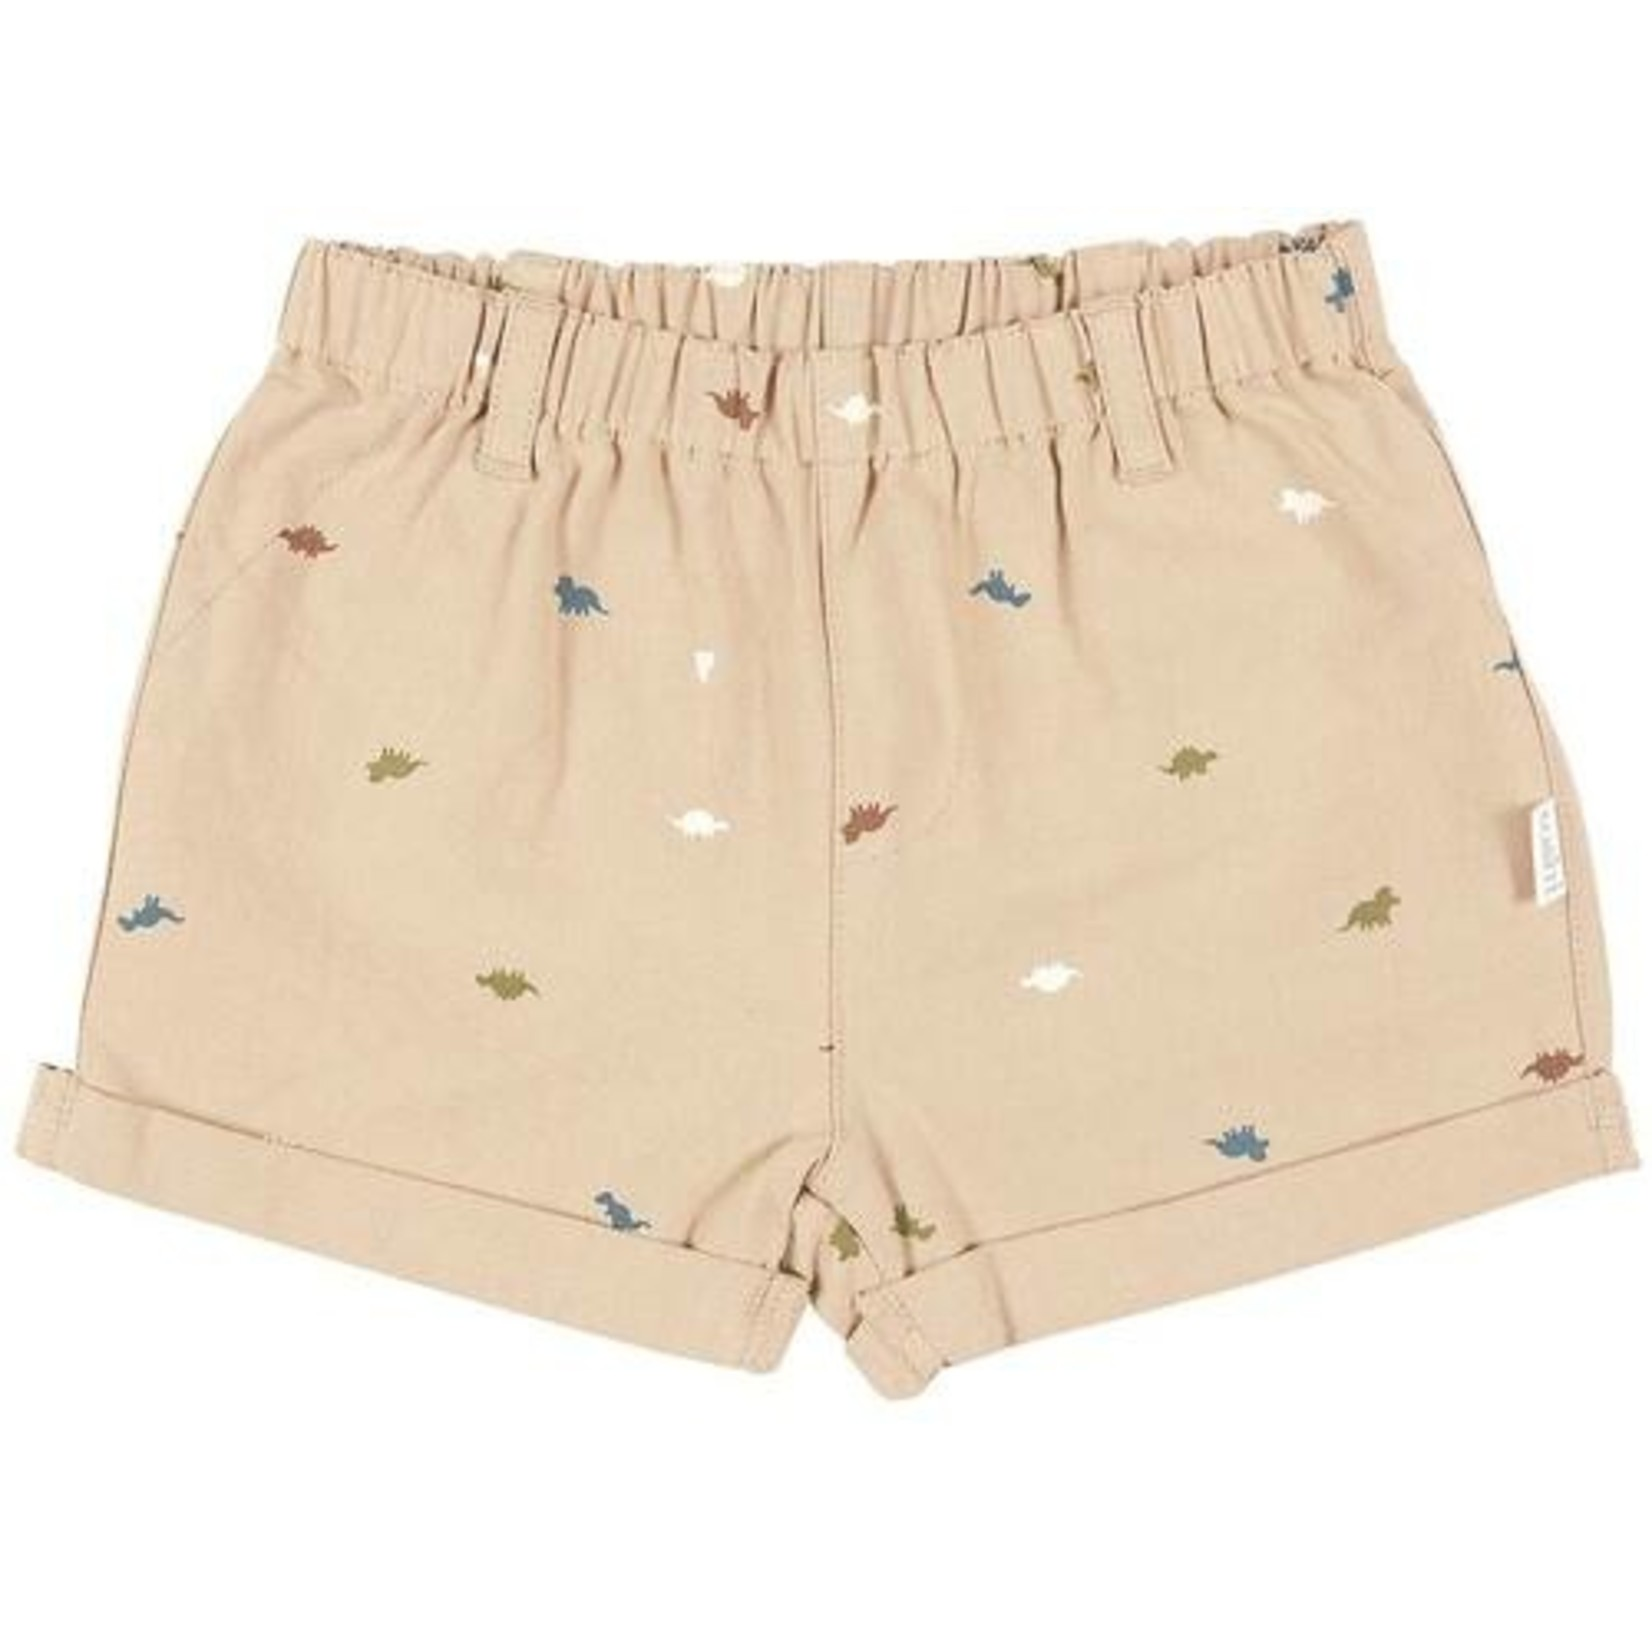 Toshi Toshi Shorts - Jungle Giants